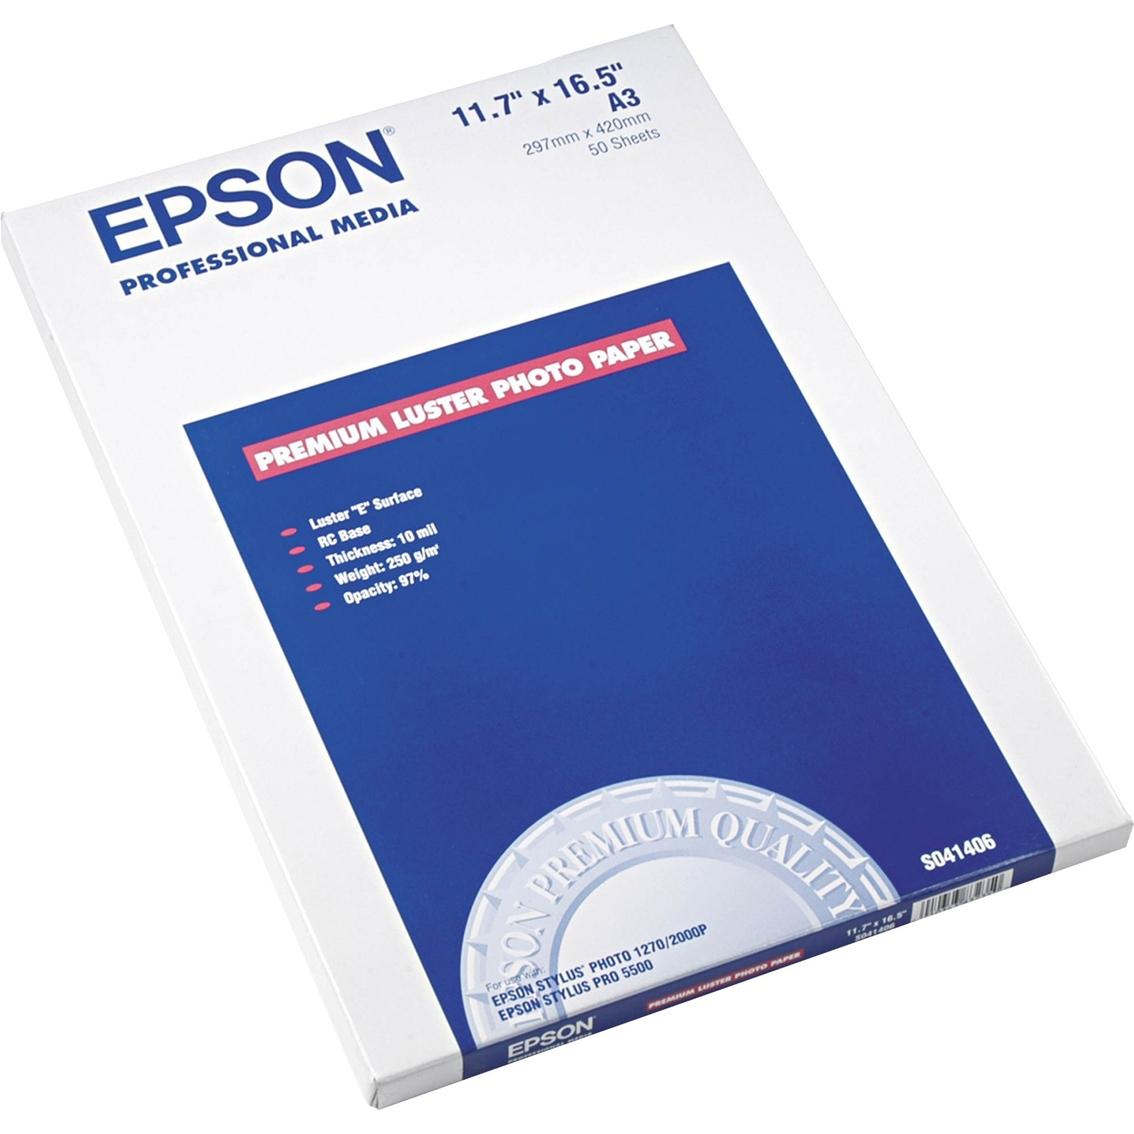 Epson 11 75 X 16 5 In  64 Lb  Ultra Premium Photo Paper 50